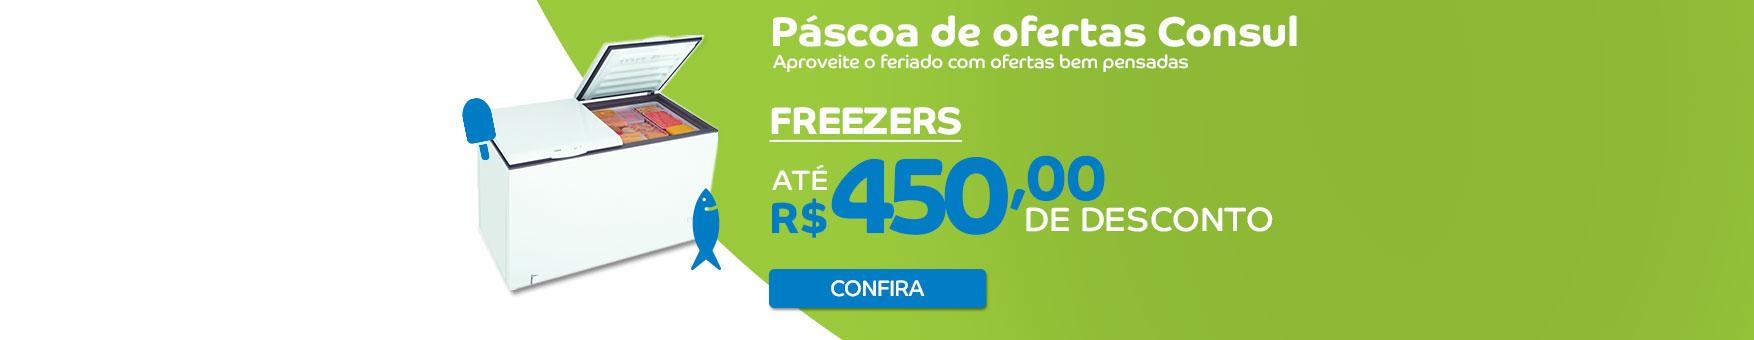 pascoa freezers